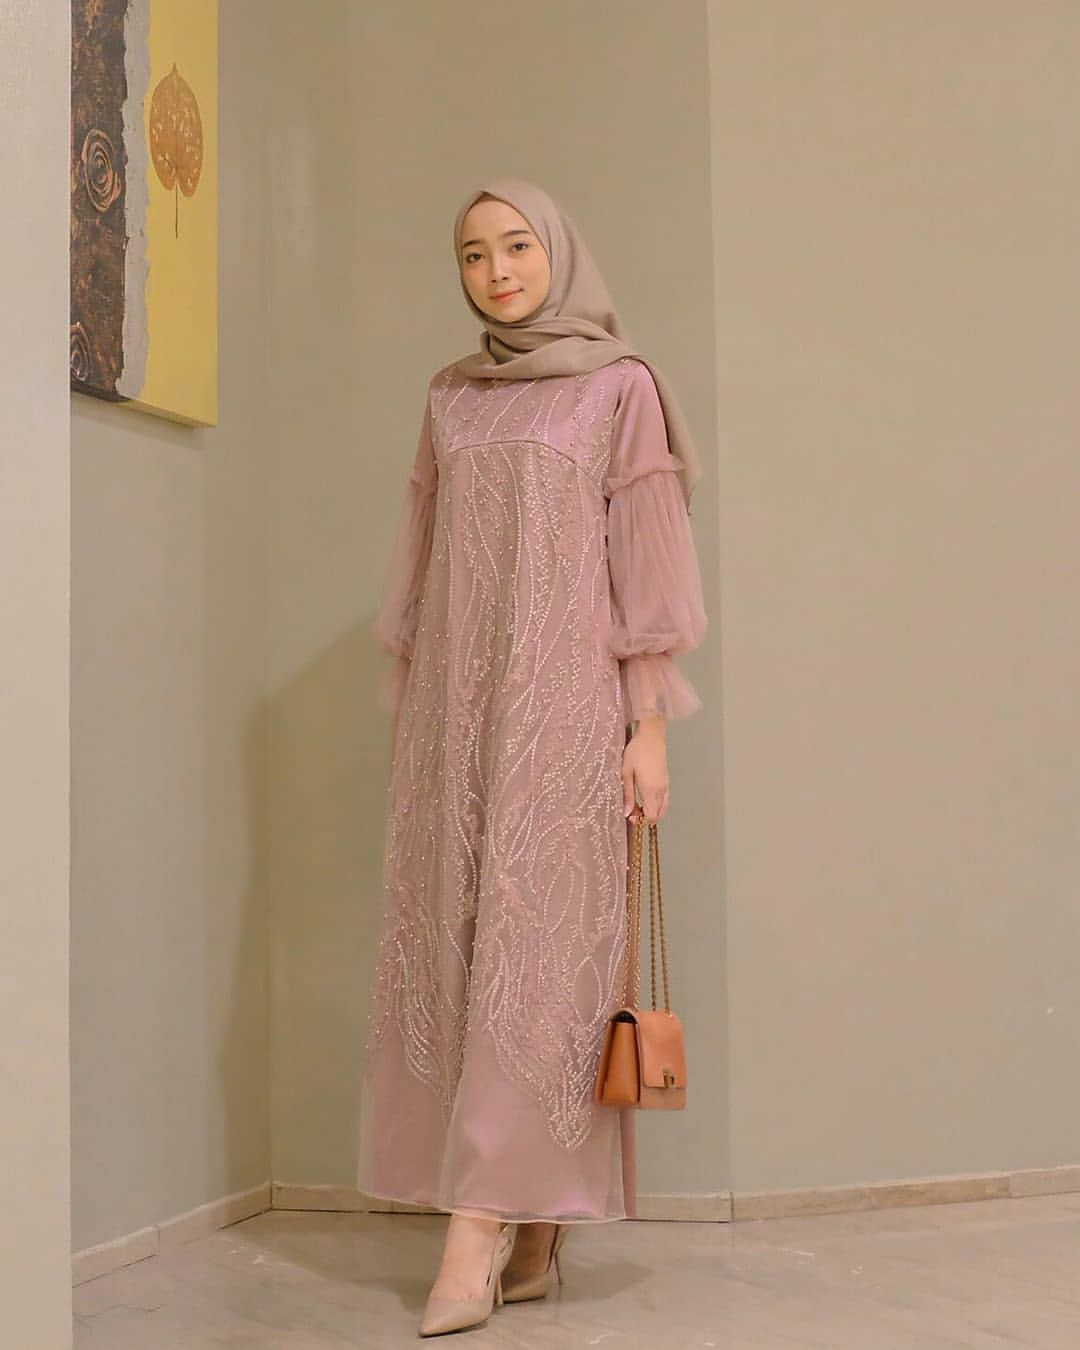 35 Model Gamis Remaja Modern Syar I Terbaru 2020 Bergaya